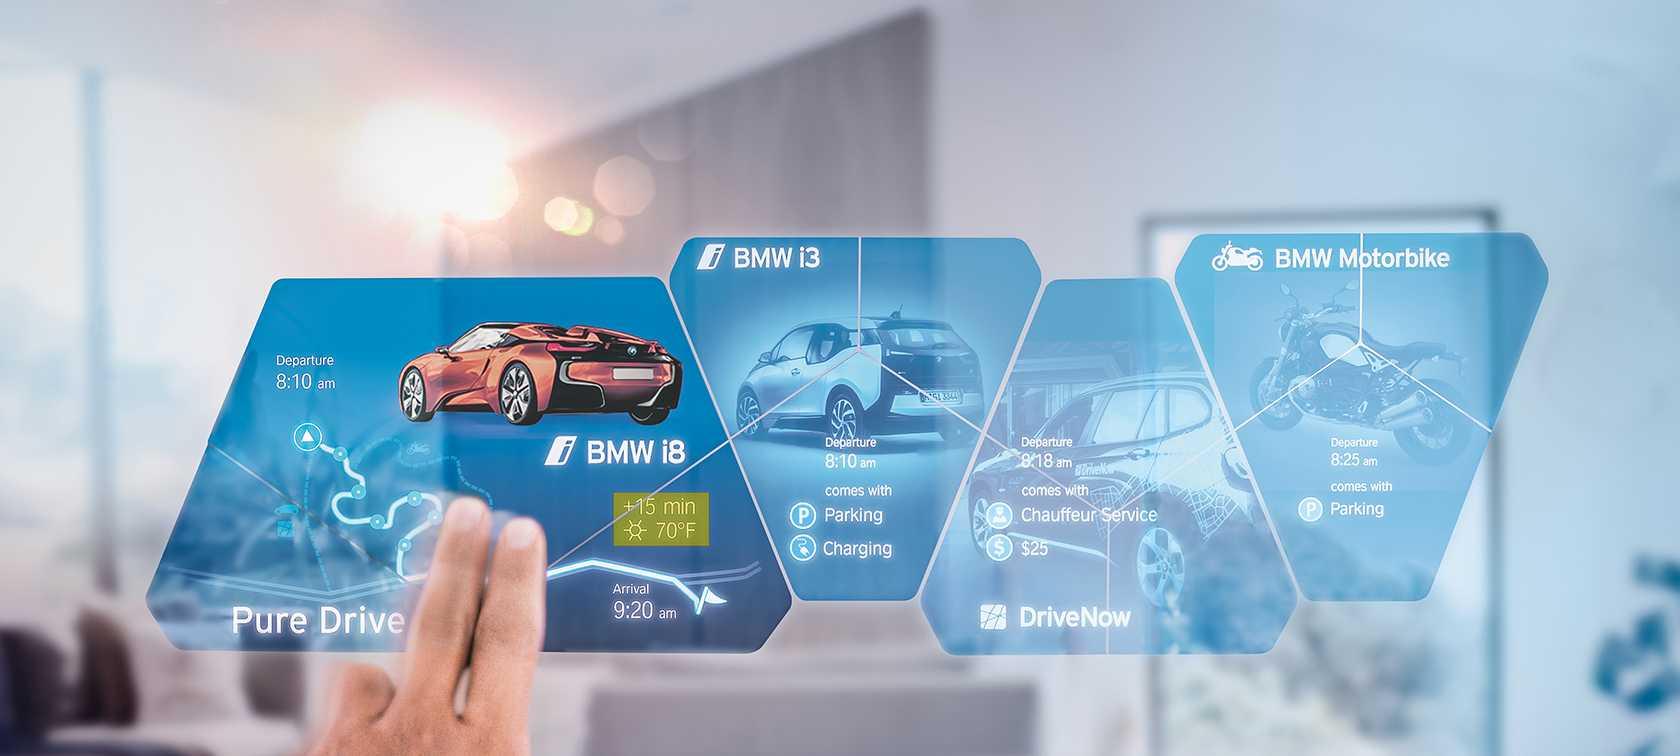 2009 BMW Vision EfficientDynamics Concept - характеристики, фото, цена.